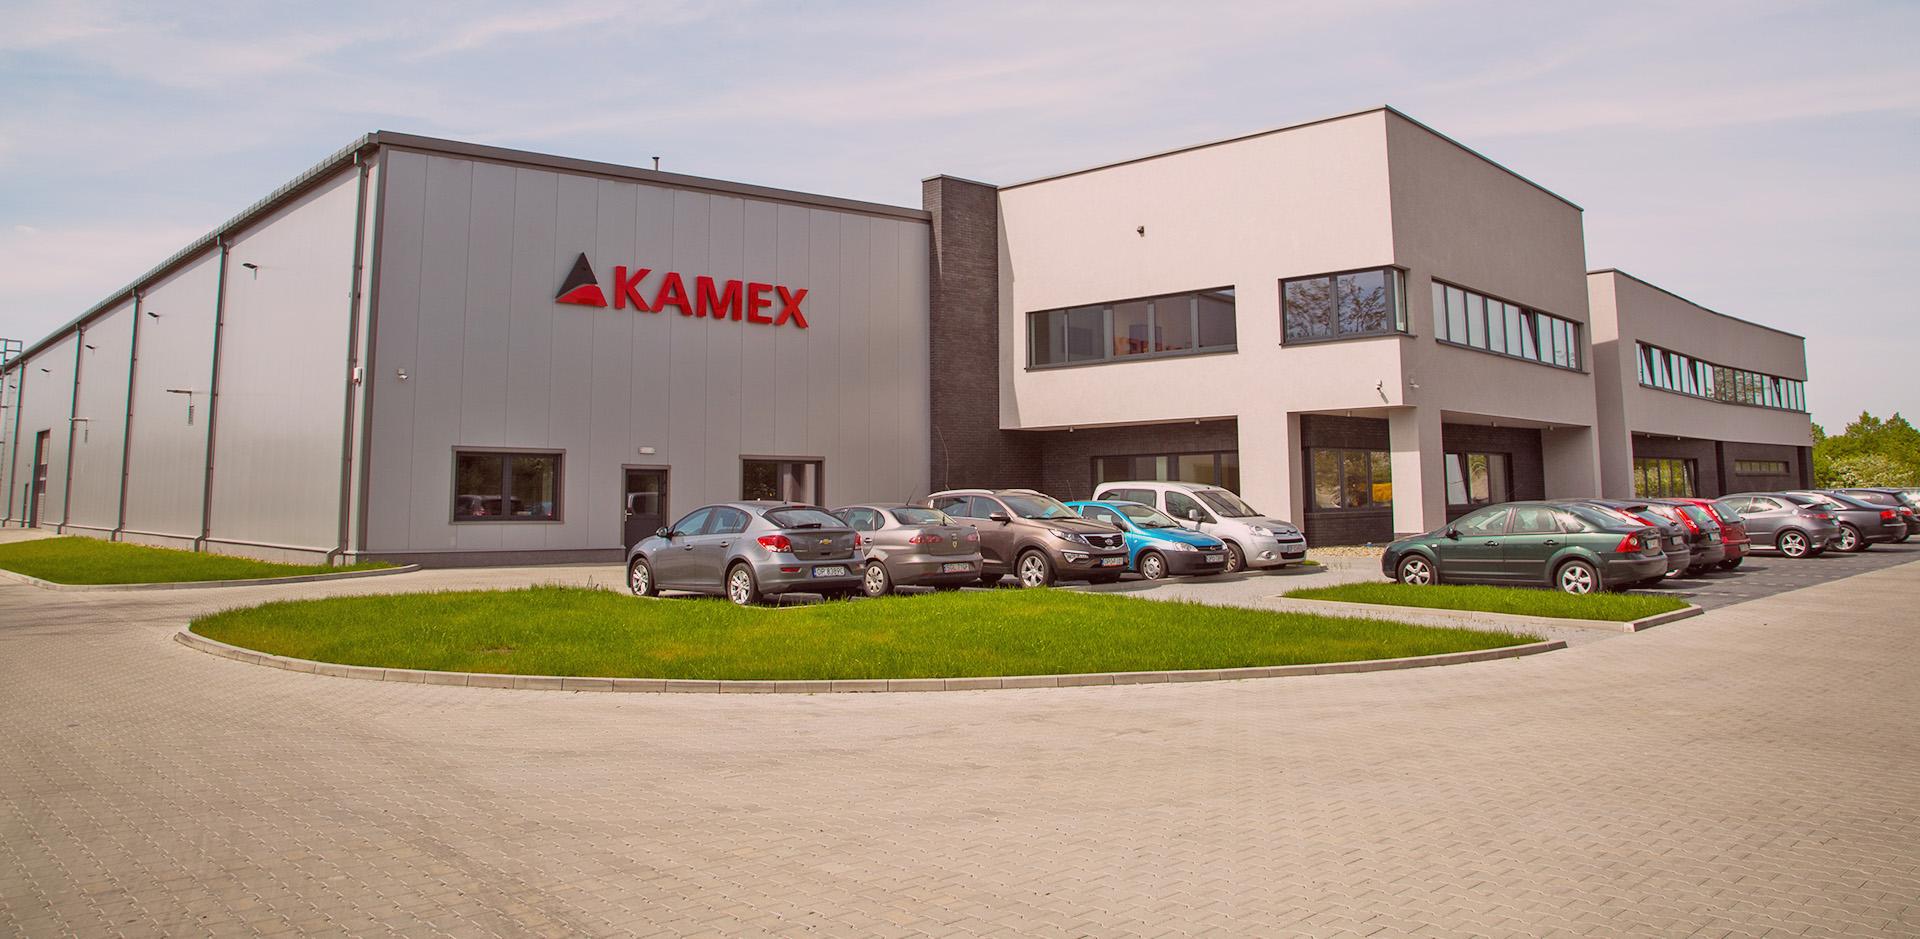 kamex, slider-kontakt KONTAKT